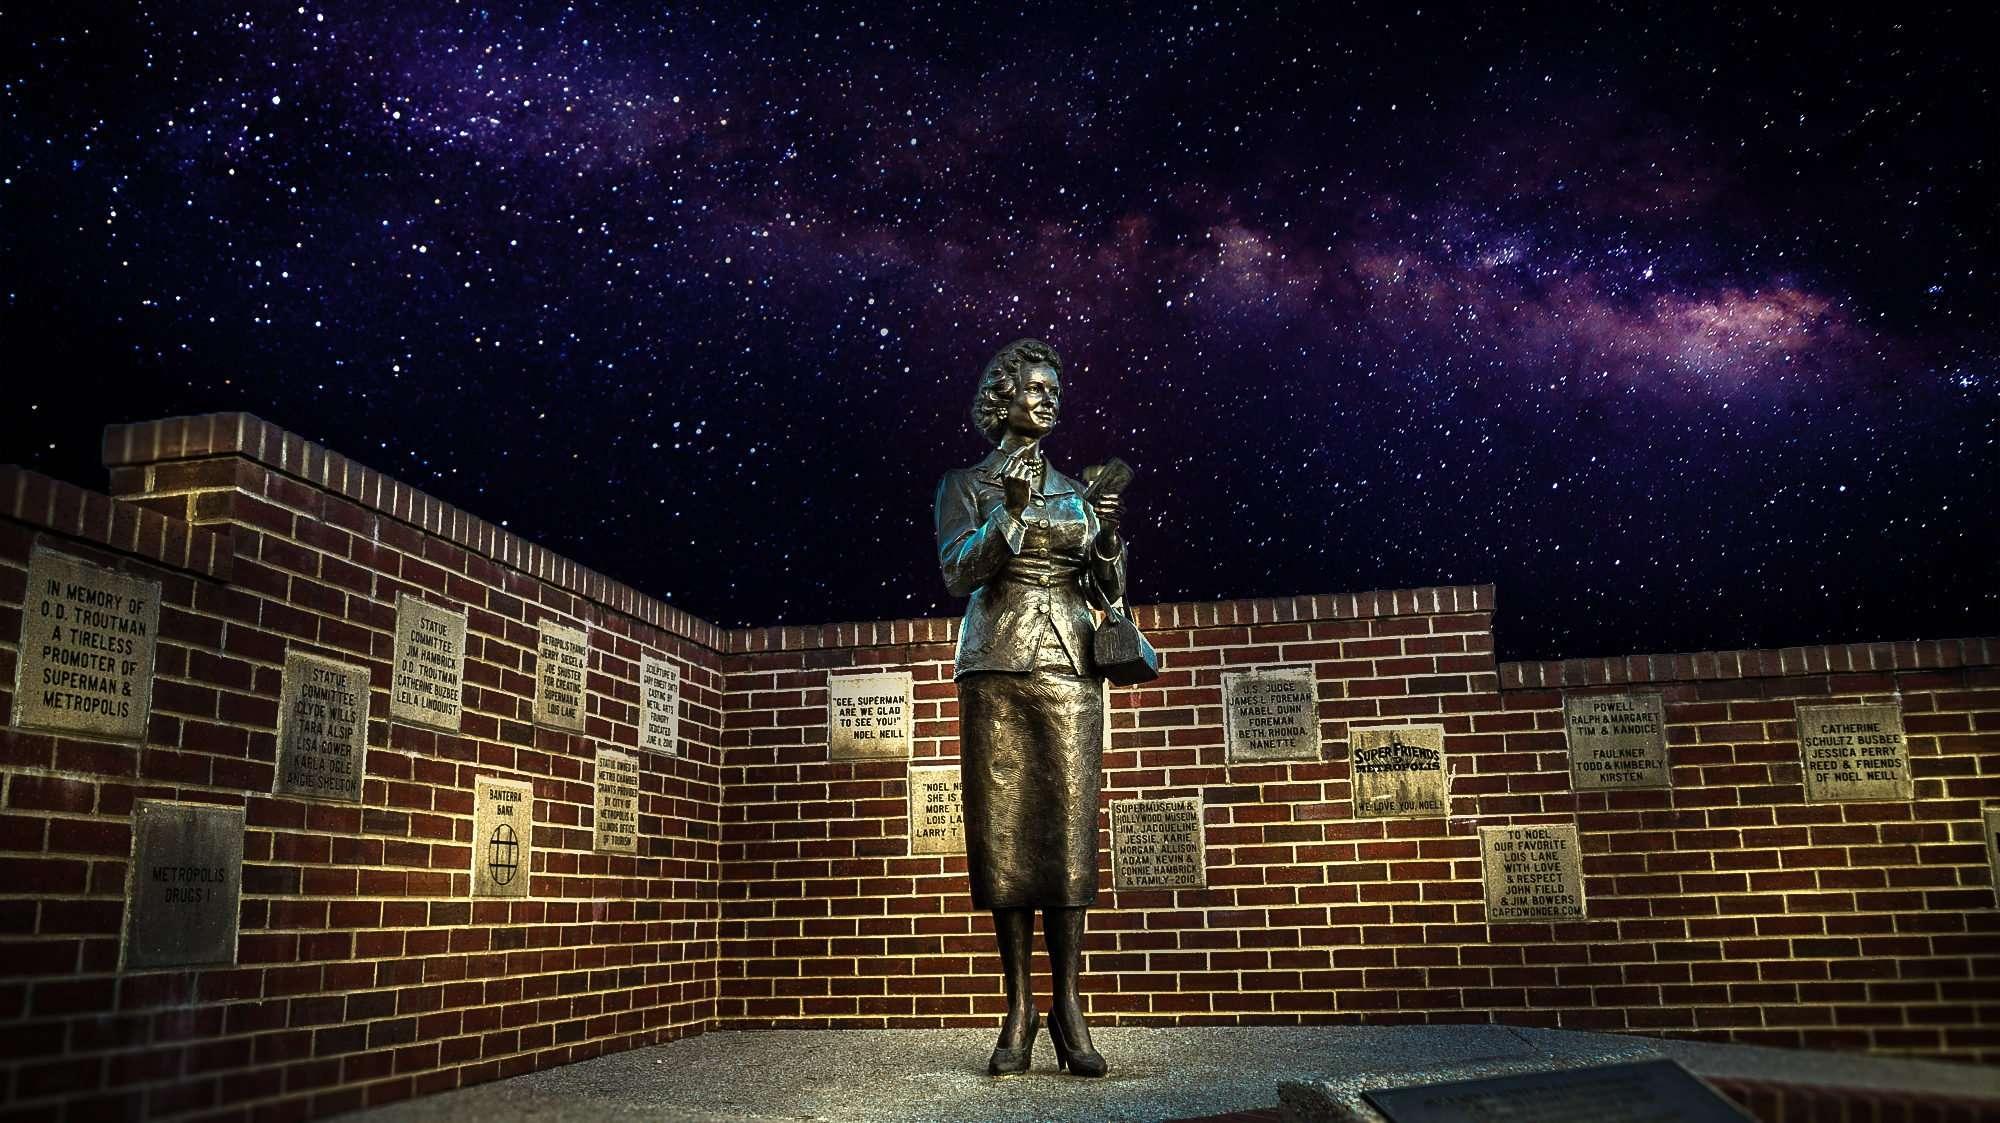 2017 - Lois Lane statue starry night, Metropolis, IL/photonews247.com